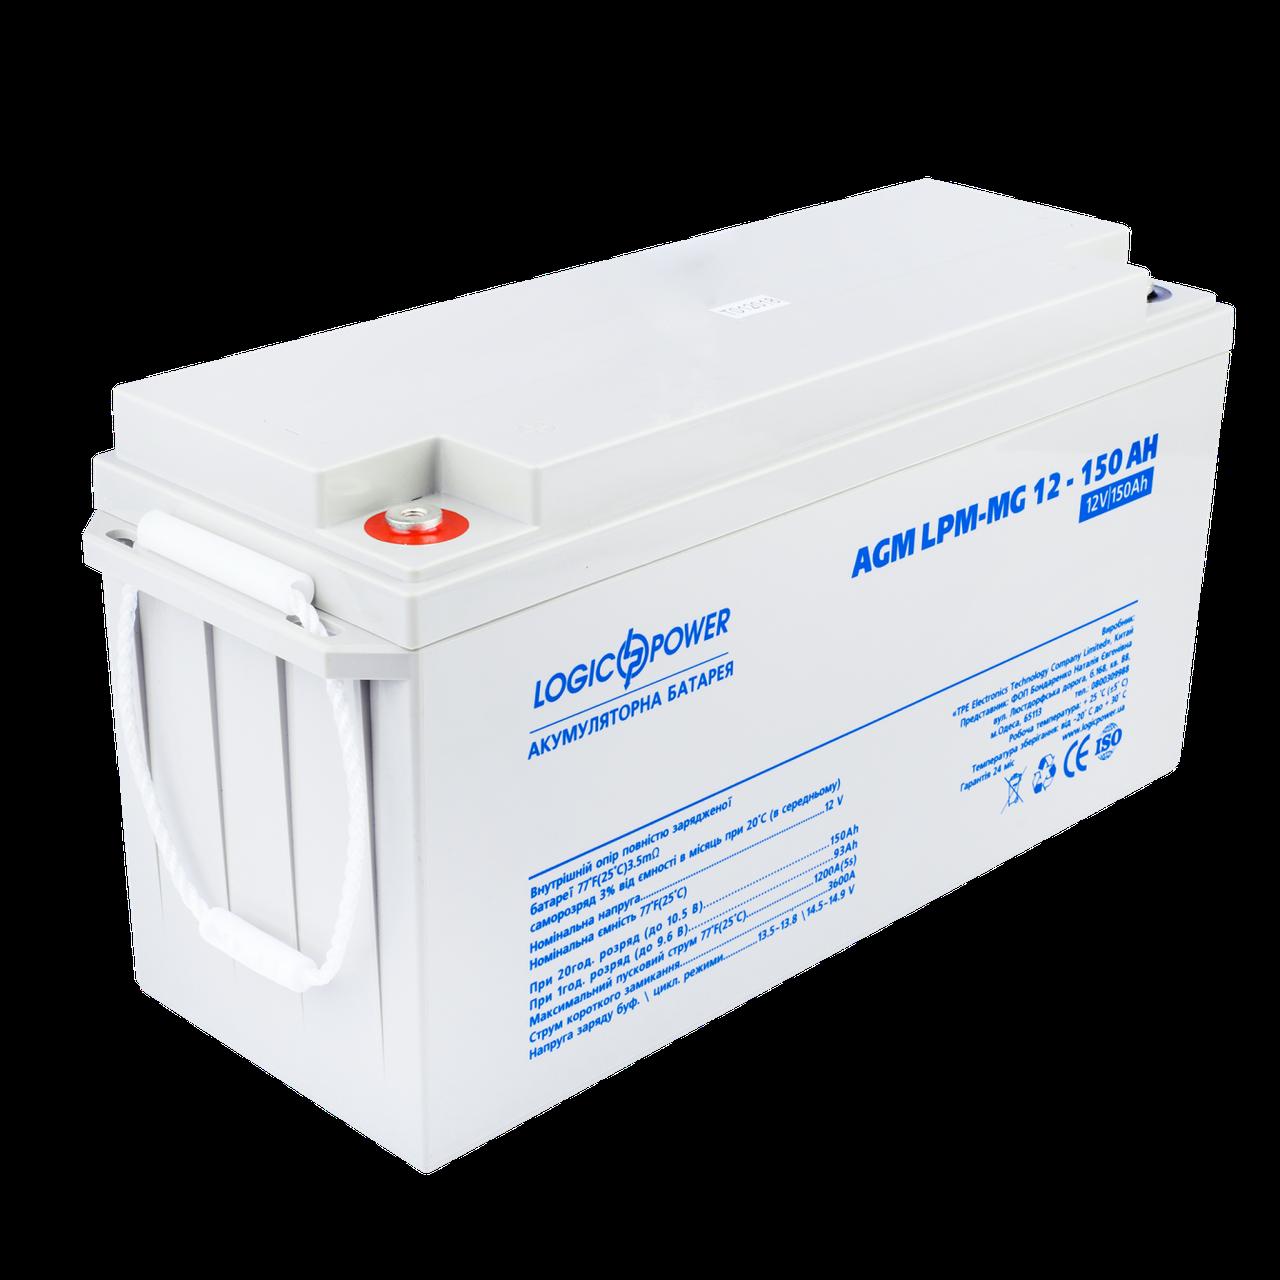 Аккумулятор мультигелевый LogicPower AGM LPM-MG 12 - 150Ah